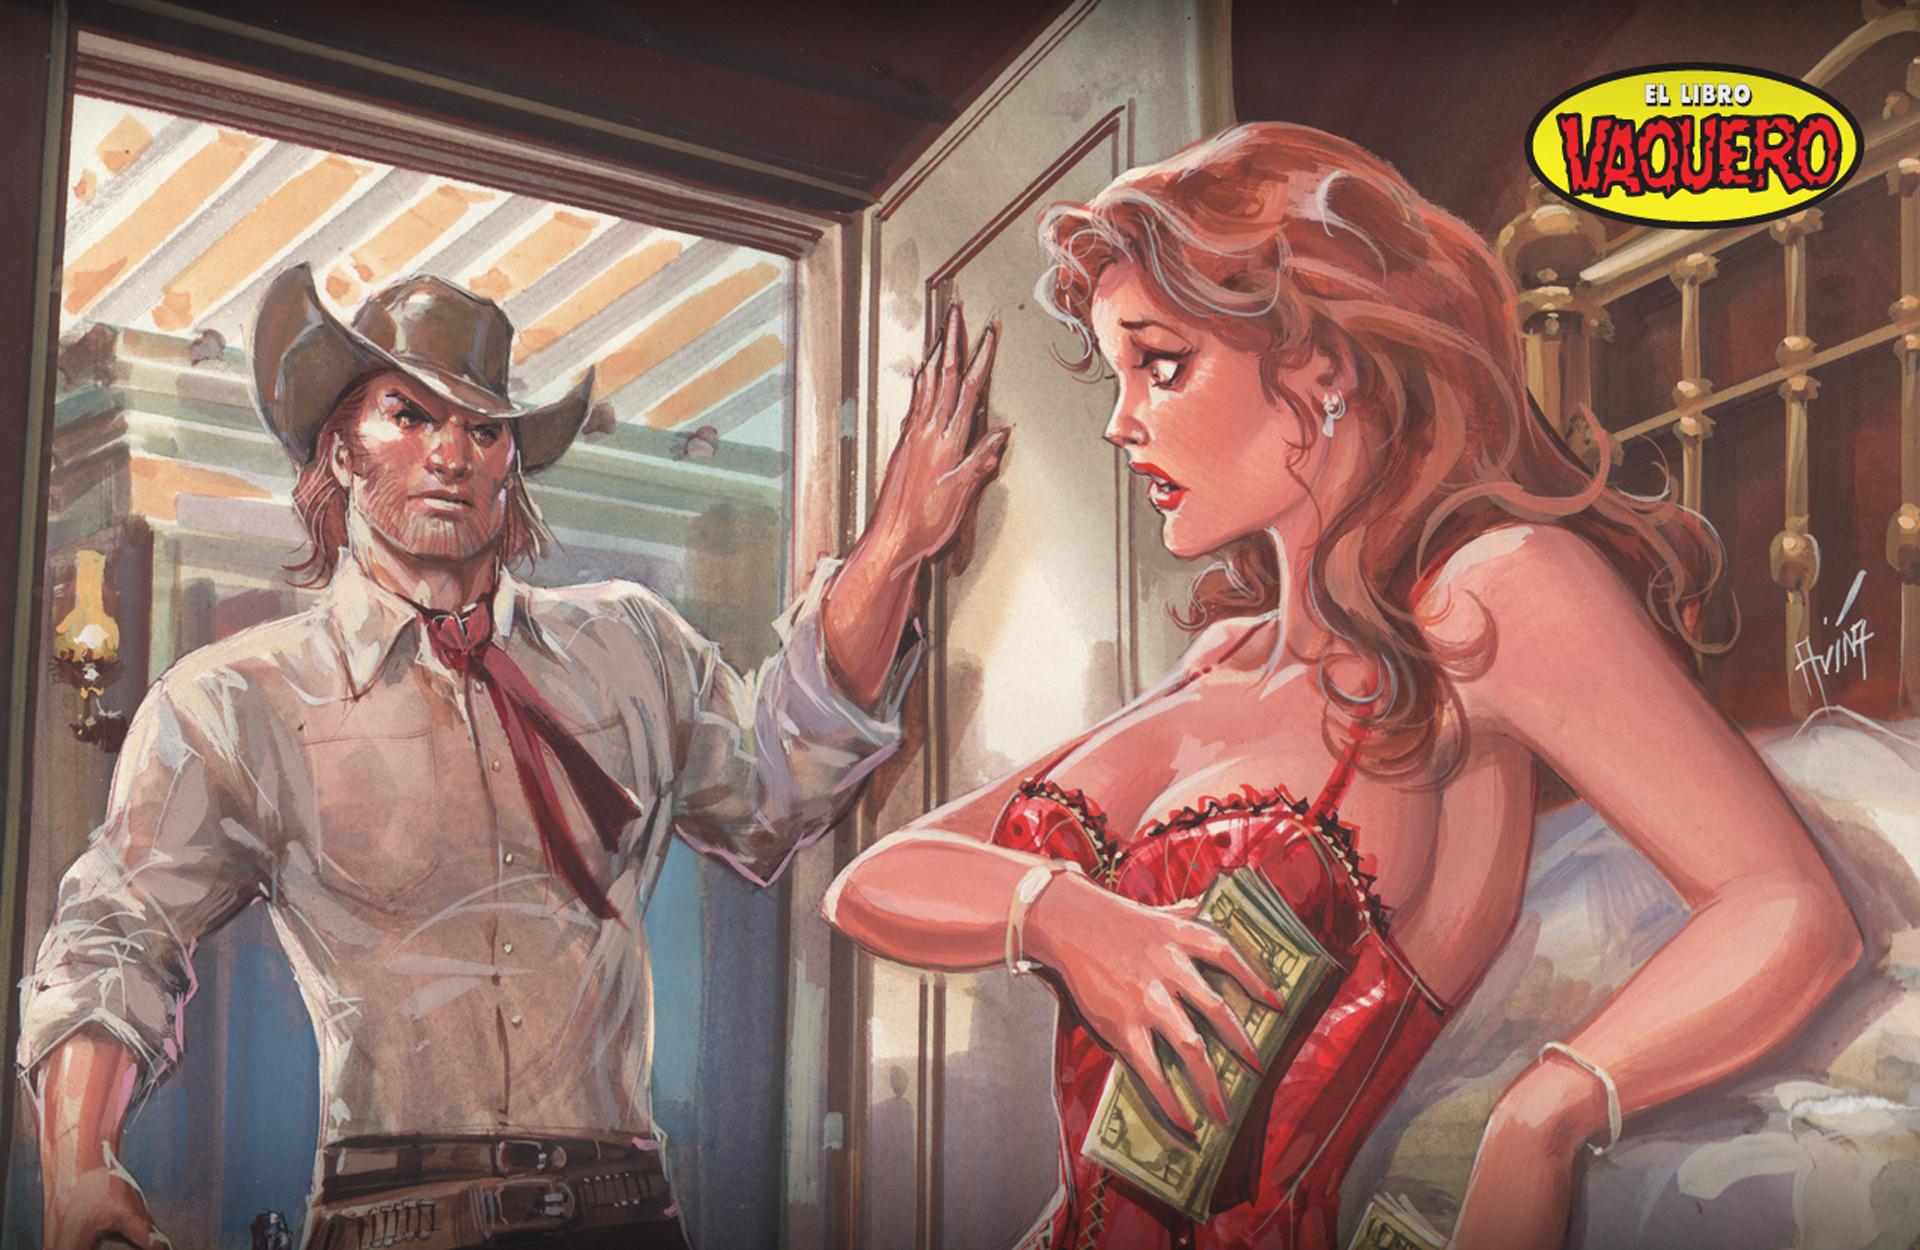 Pelicula Porn Mexicana Clasica manga mexicano: ¿a quiÉn le dices Ñero si me conoces mejor